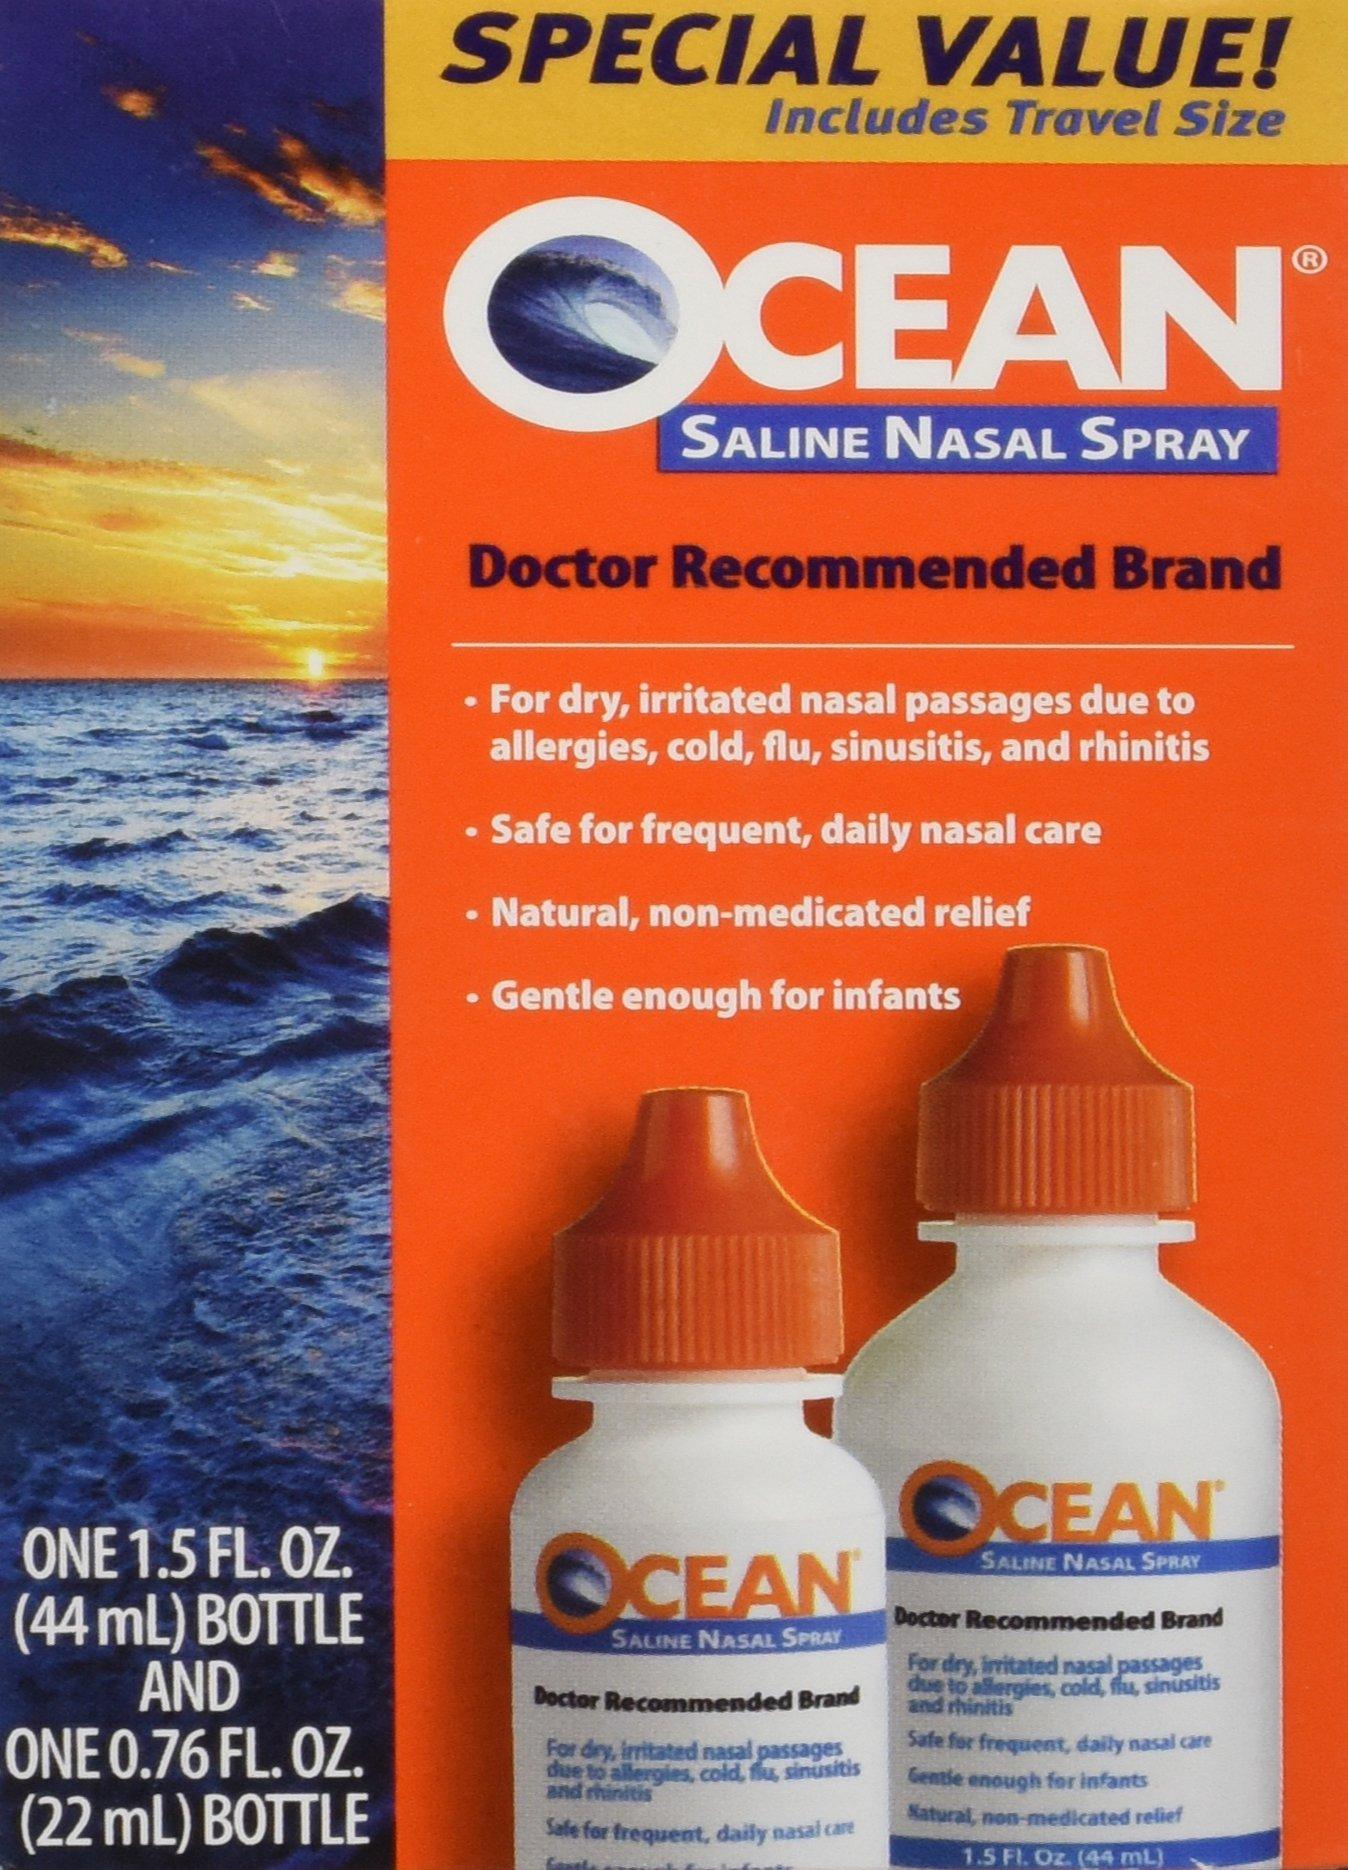 Ocean Saline Nasal Spray Buddy Pack 1.5oz and 0.76oz Bottles